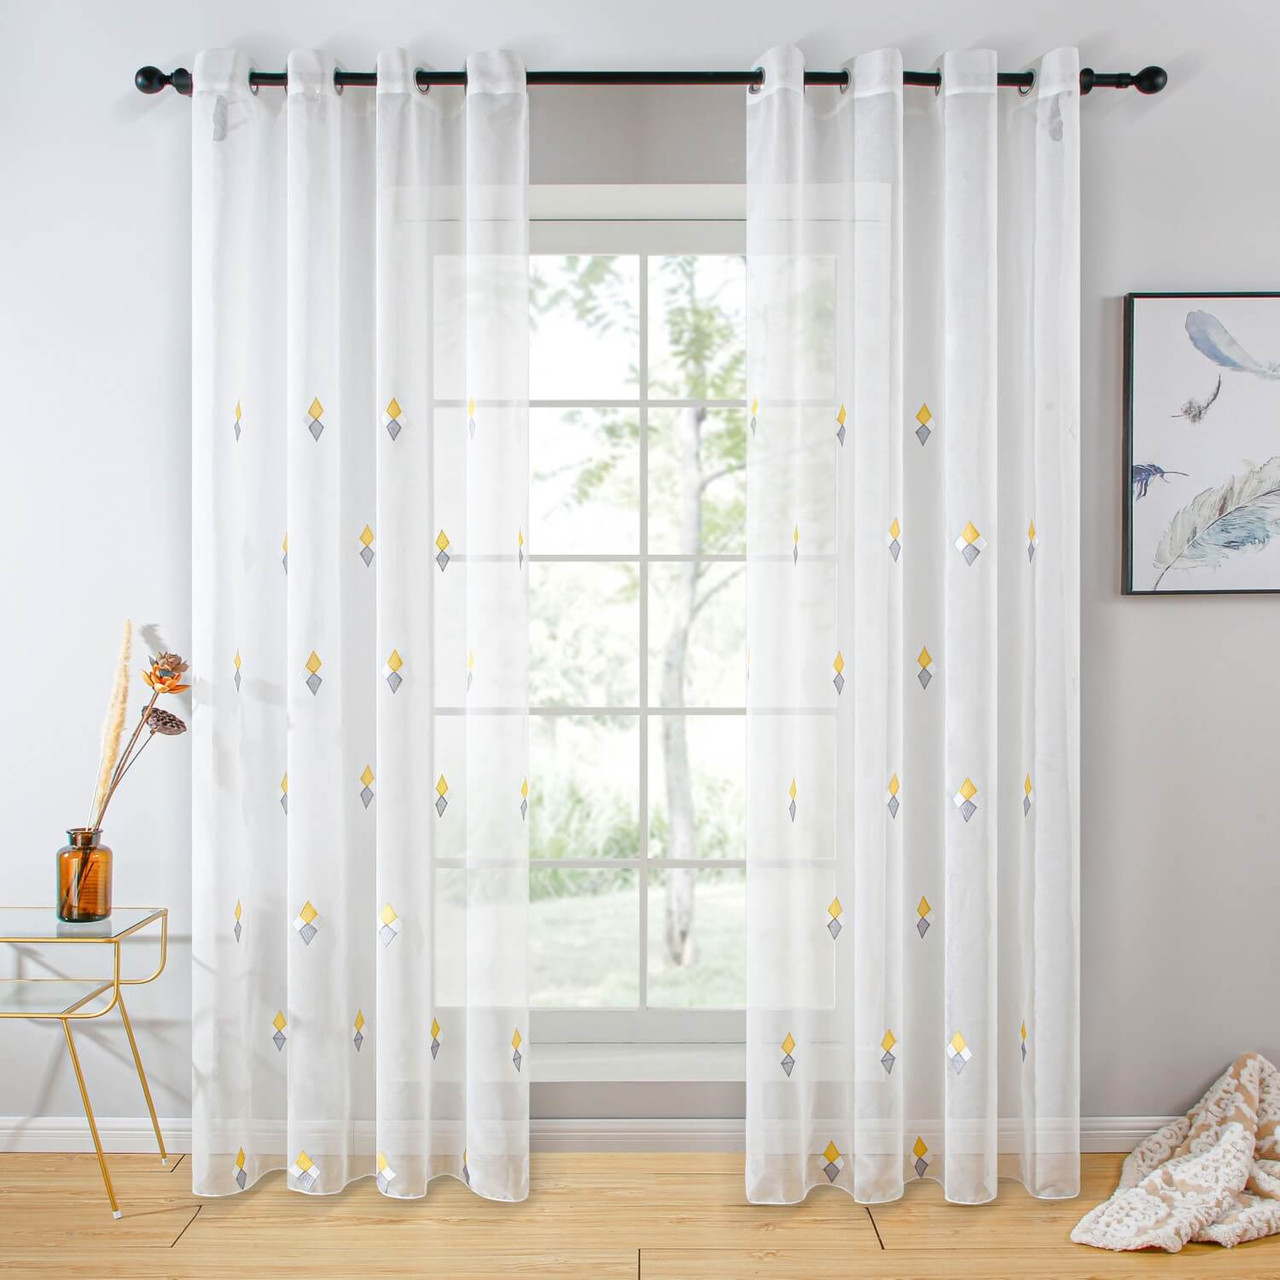 Sheer Curtain Panel Grommet-Top Window Treatments DMC726 Dolce Mela 8171460151846